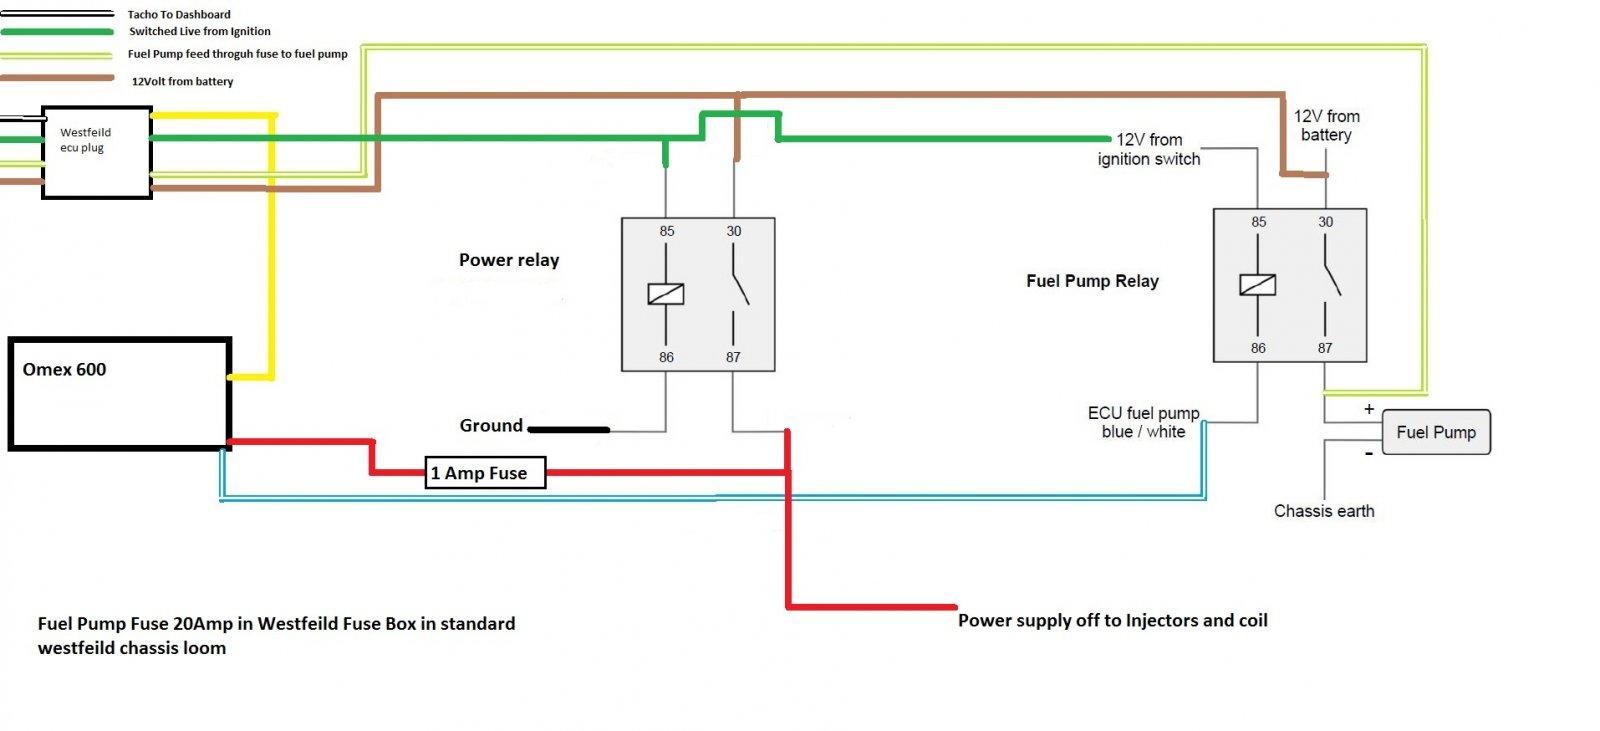 omex 600 tech talk wscc community forum rh forum wscc co uk omex clubman wiring diagram omex rev limiter wiring diagram